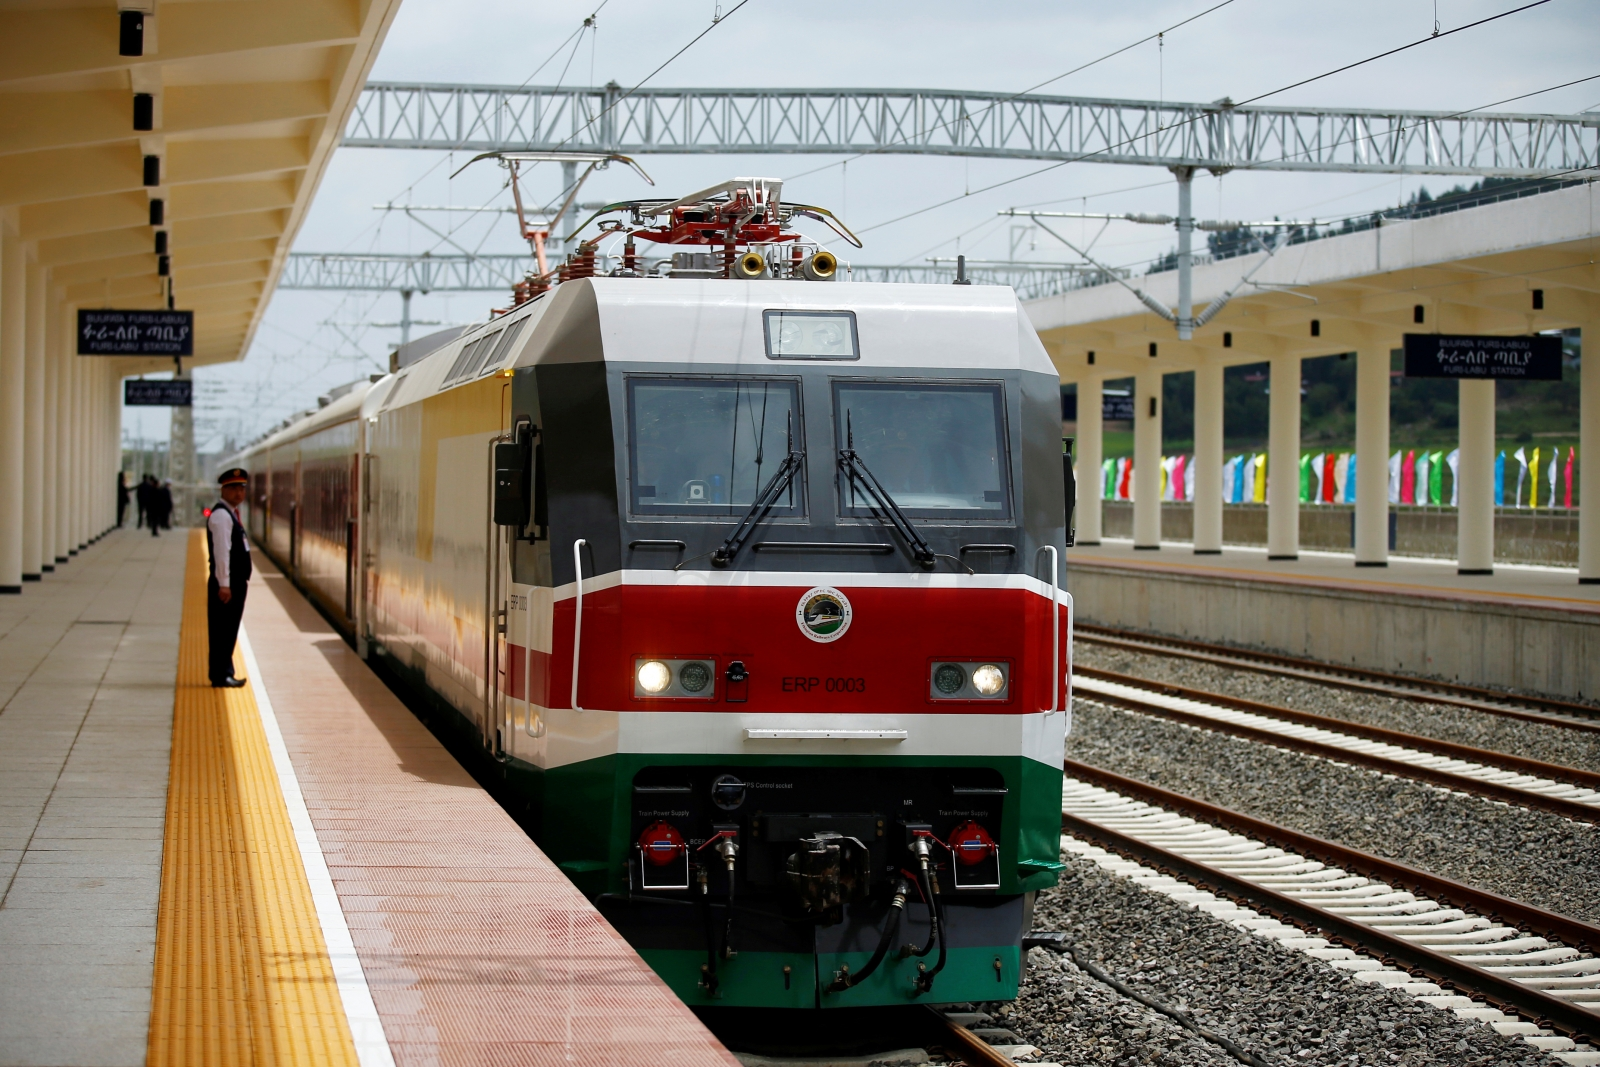 Africa train network